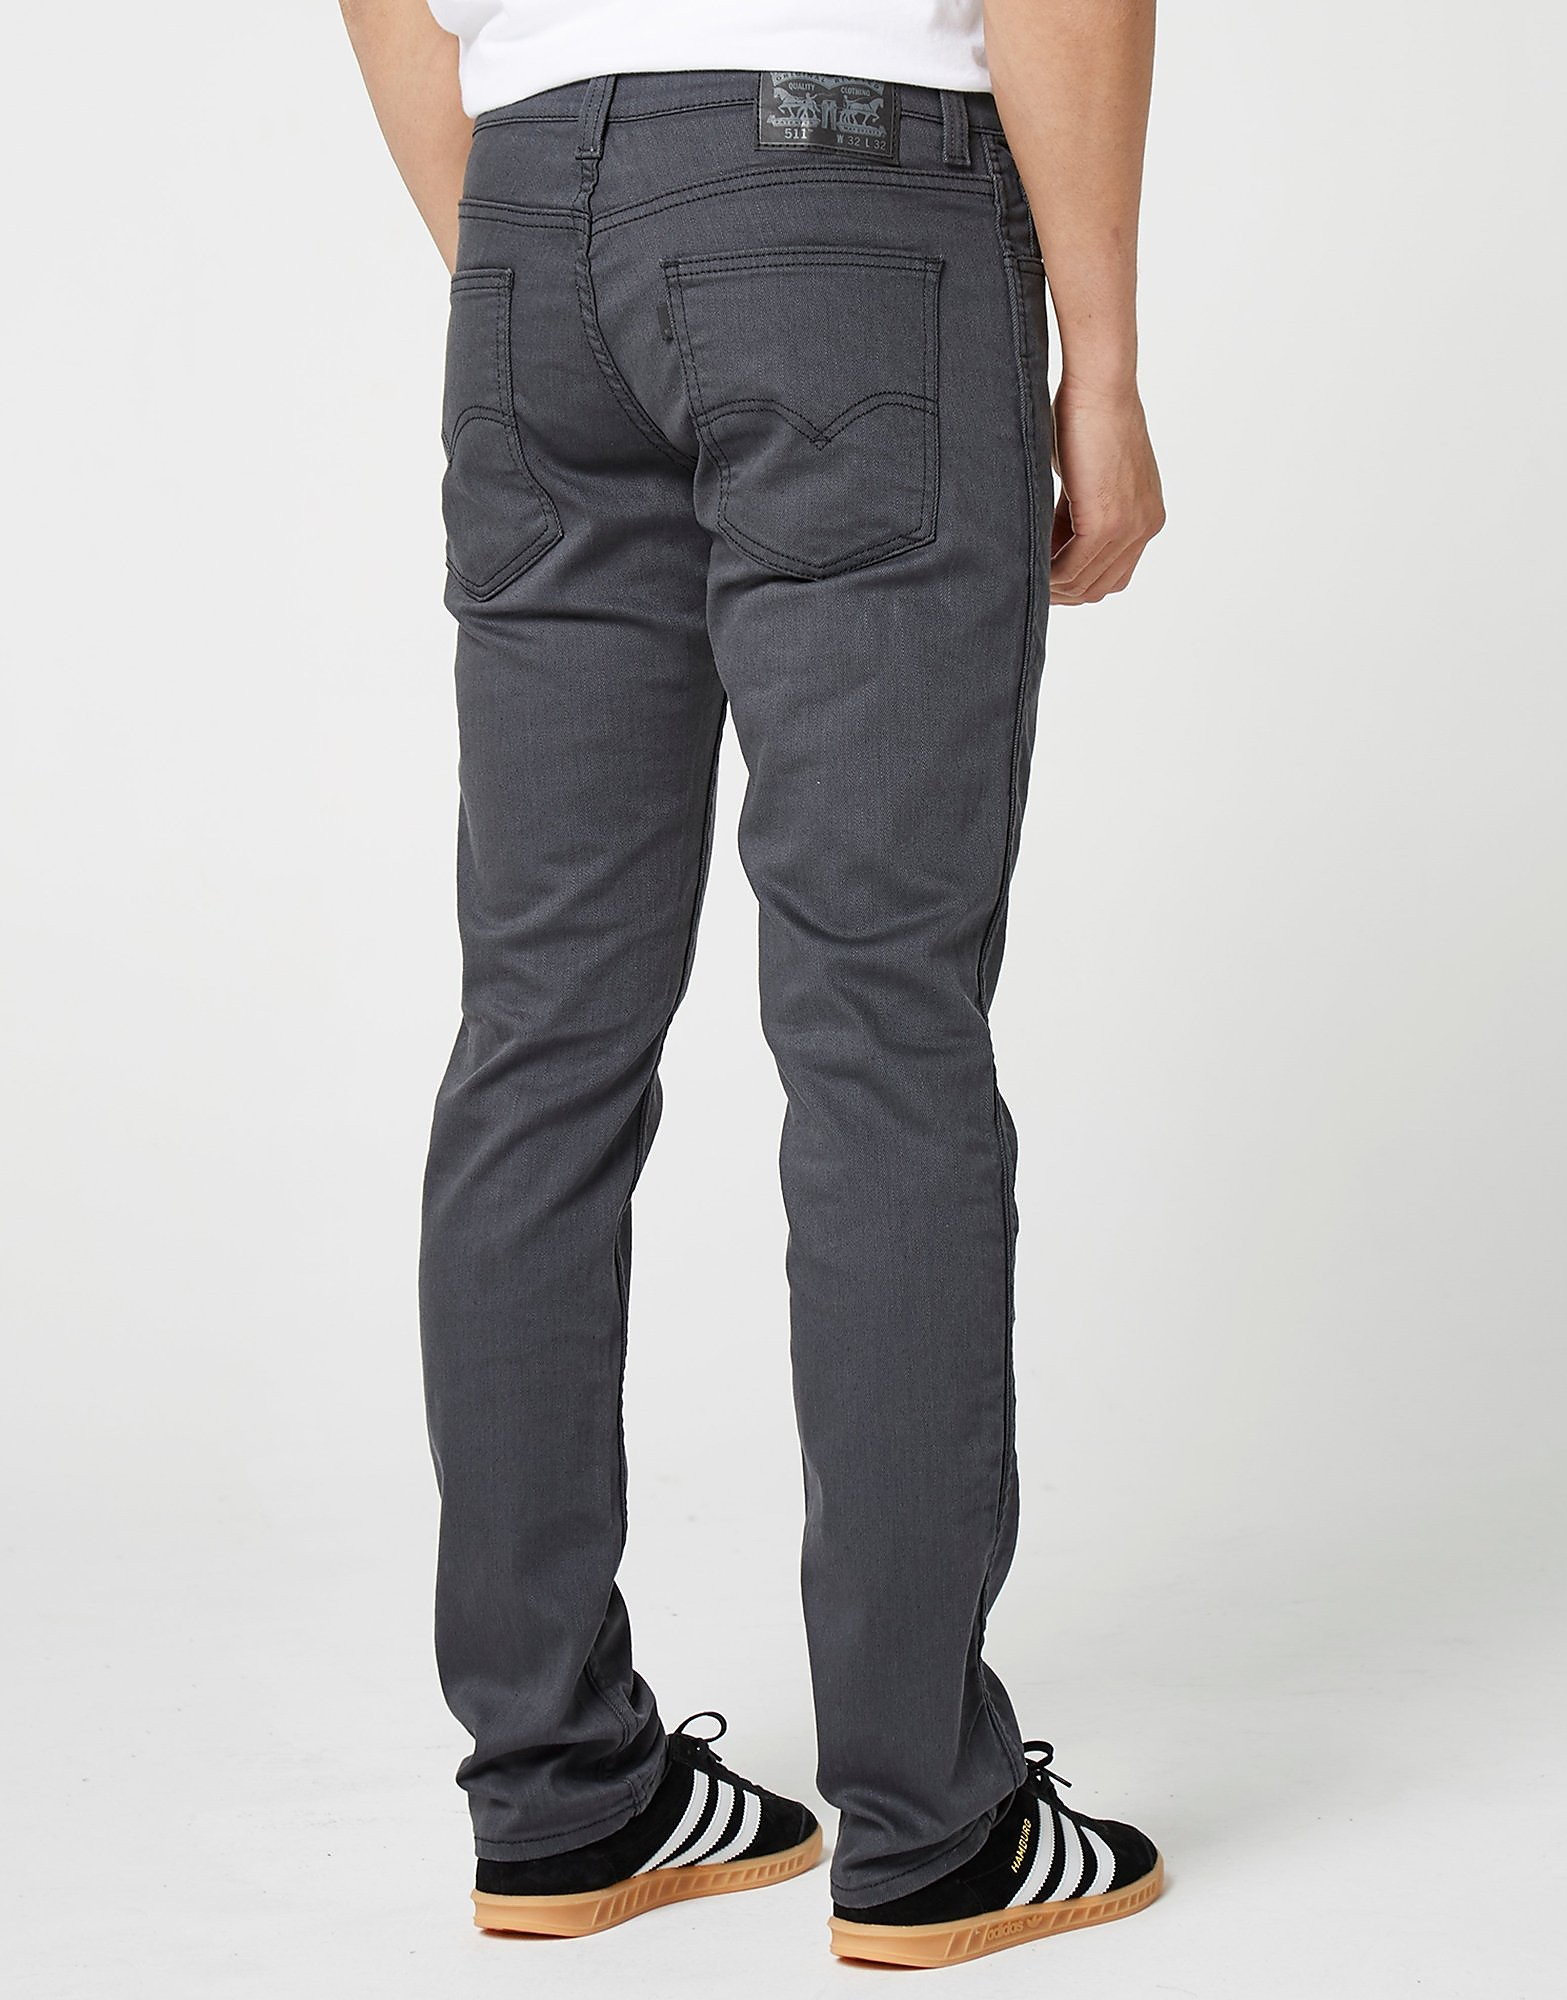 Levis 511 Slim Mid Jean